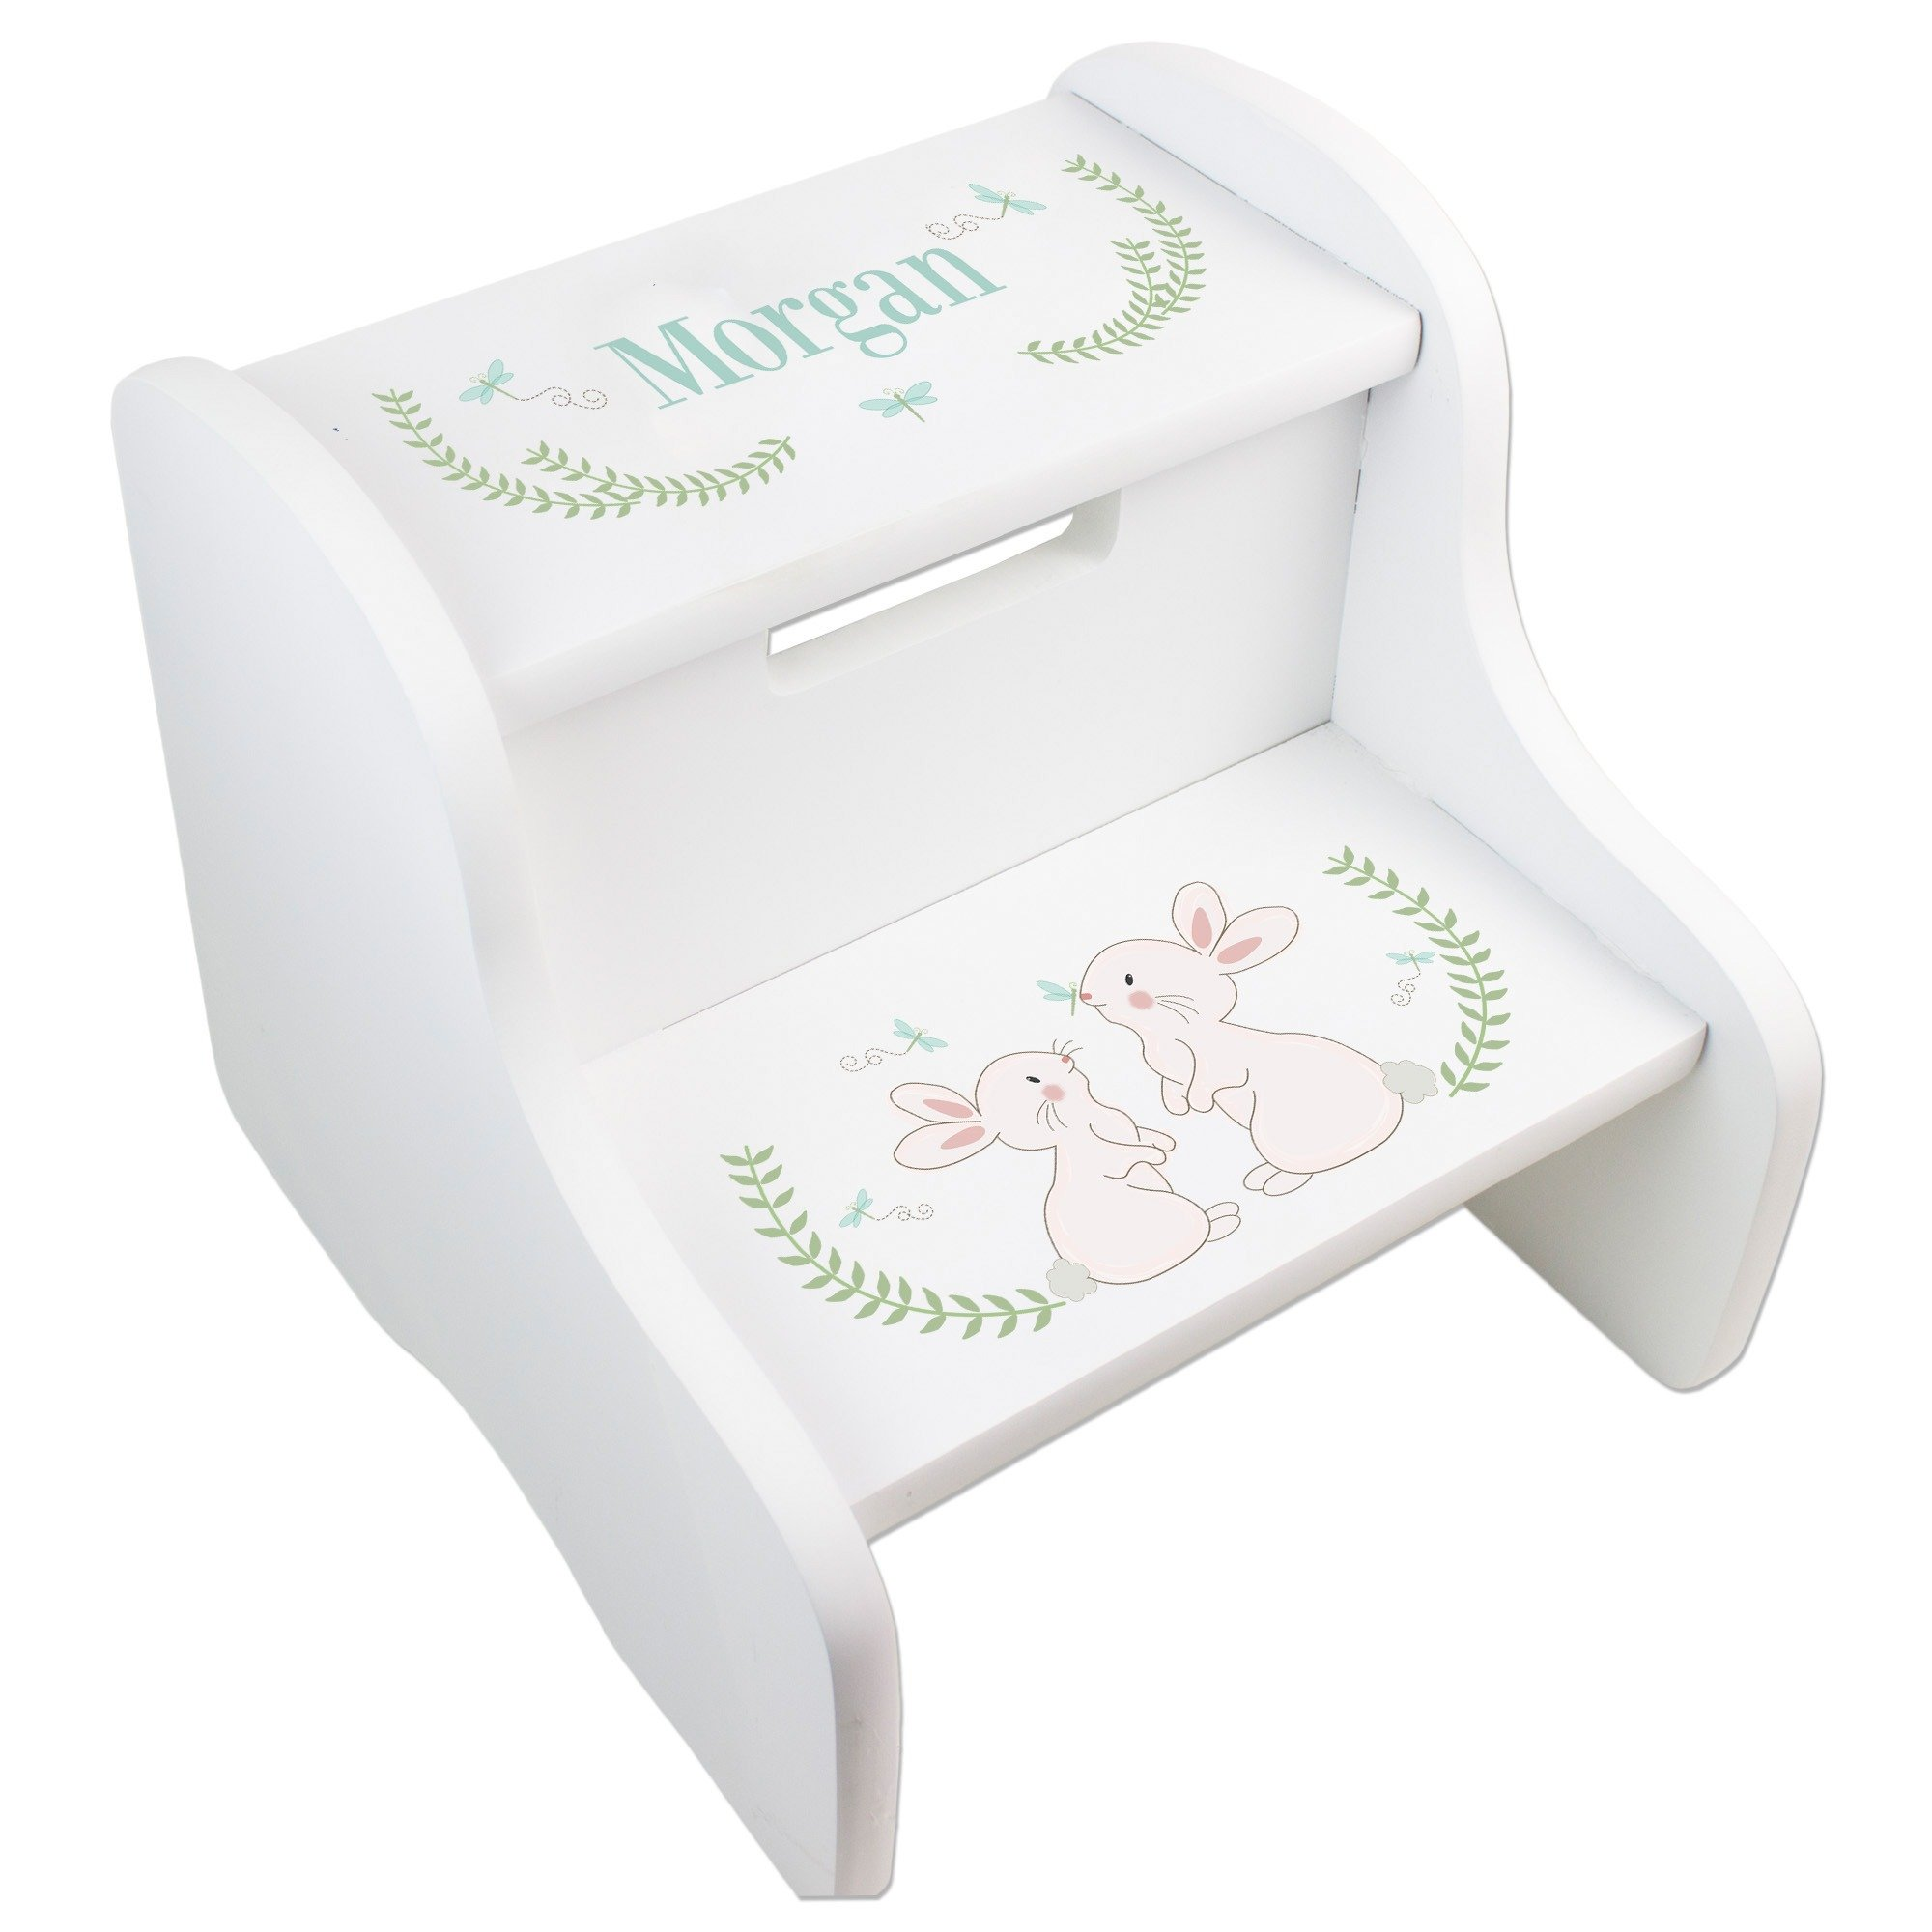 MyBambino Personalized Classic Bunny White Two Step Stool